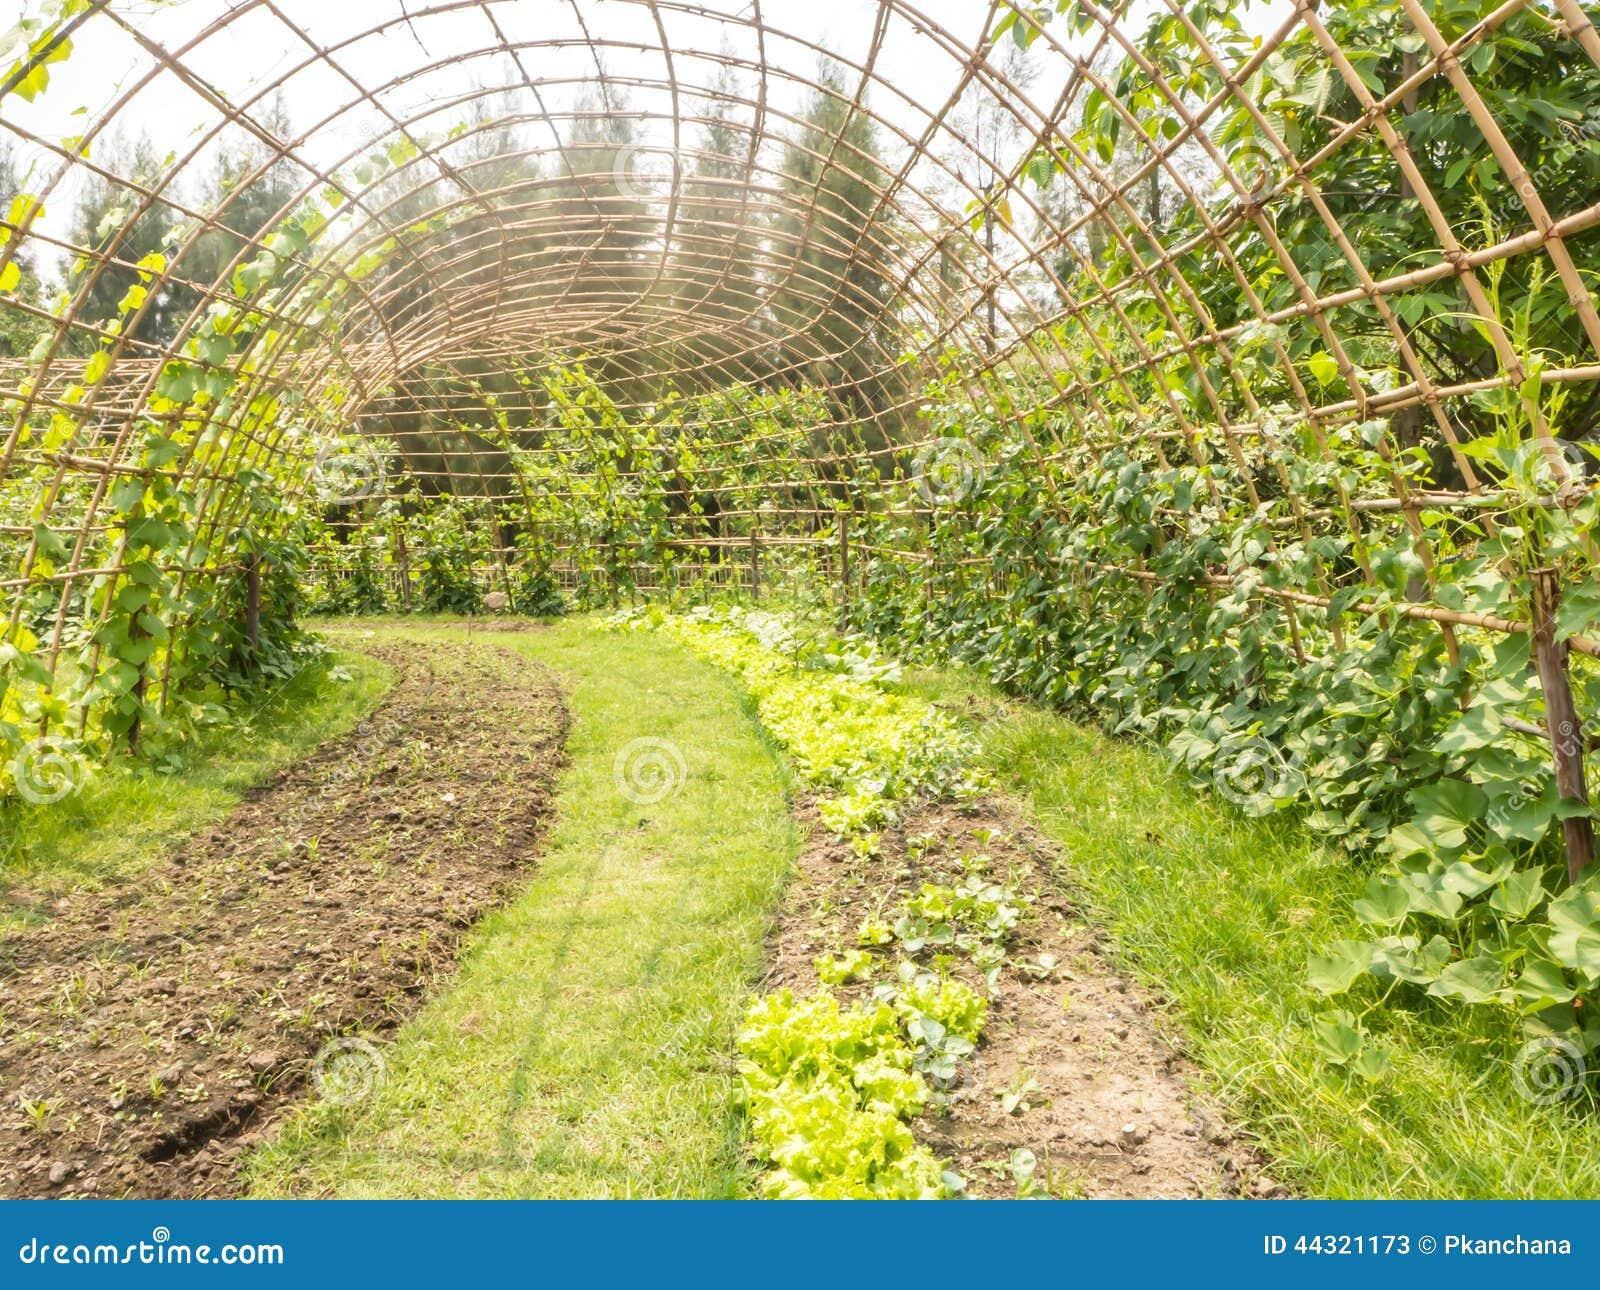 How to Start a Backyard Bamboo Business